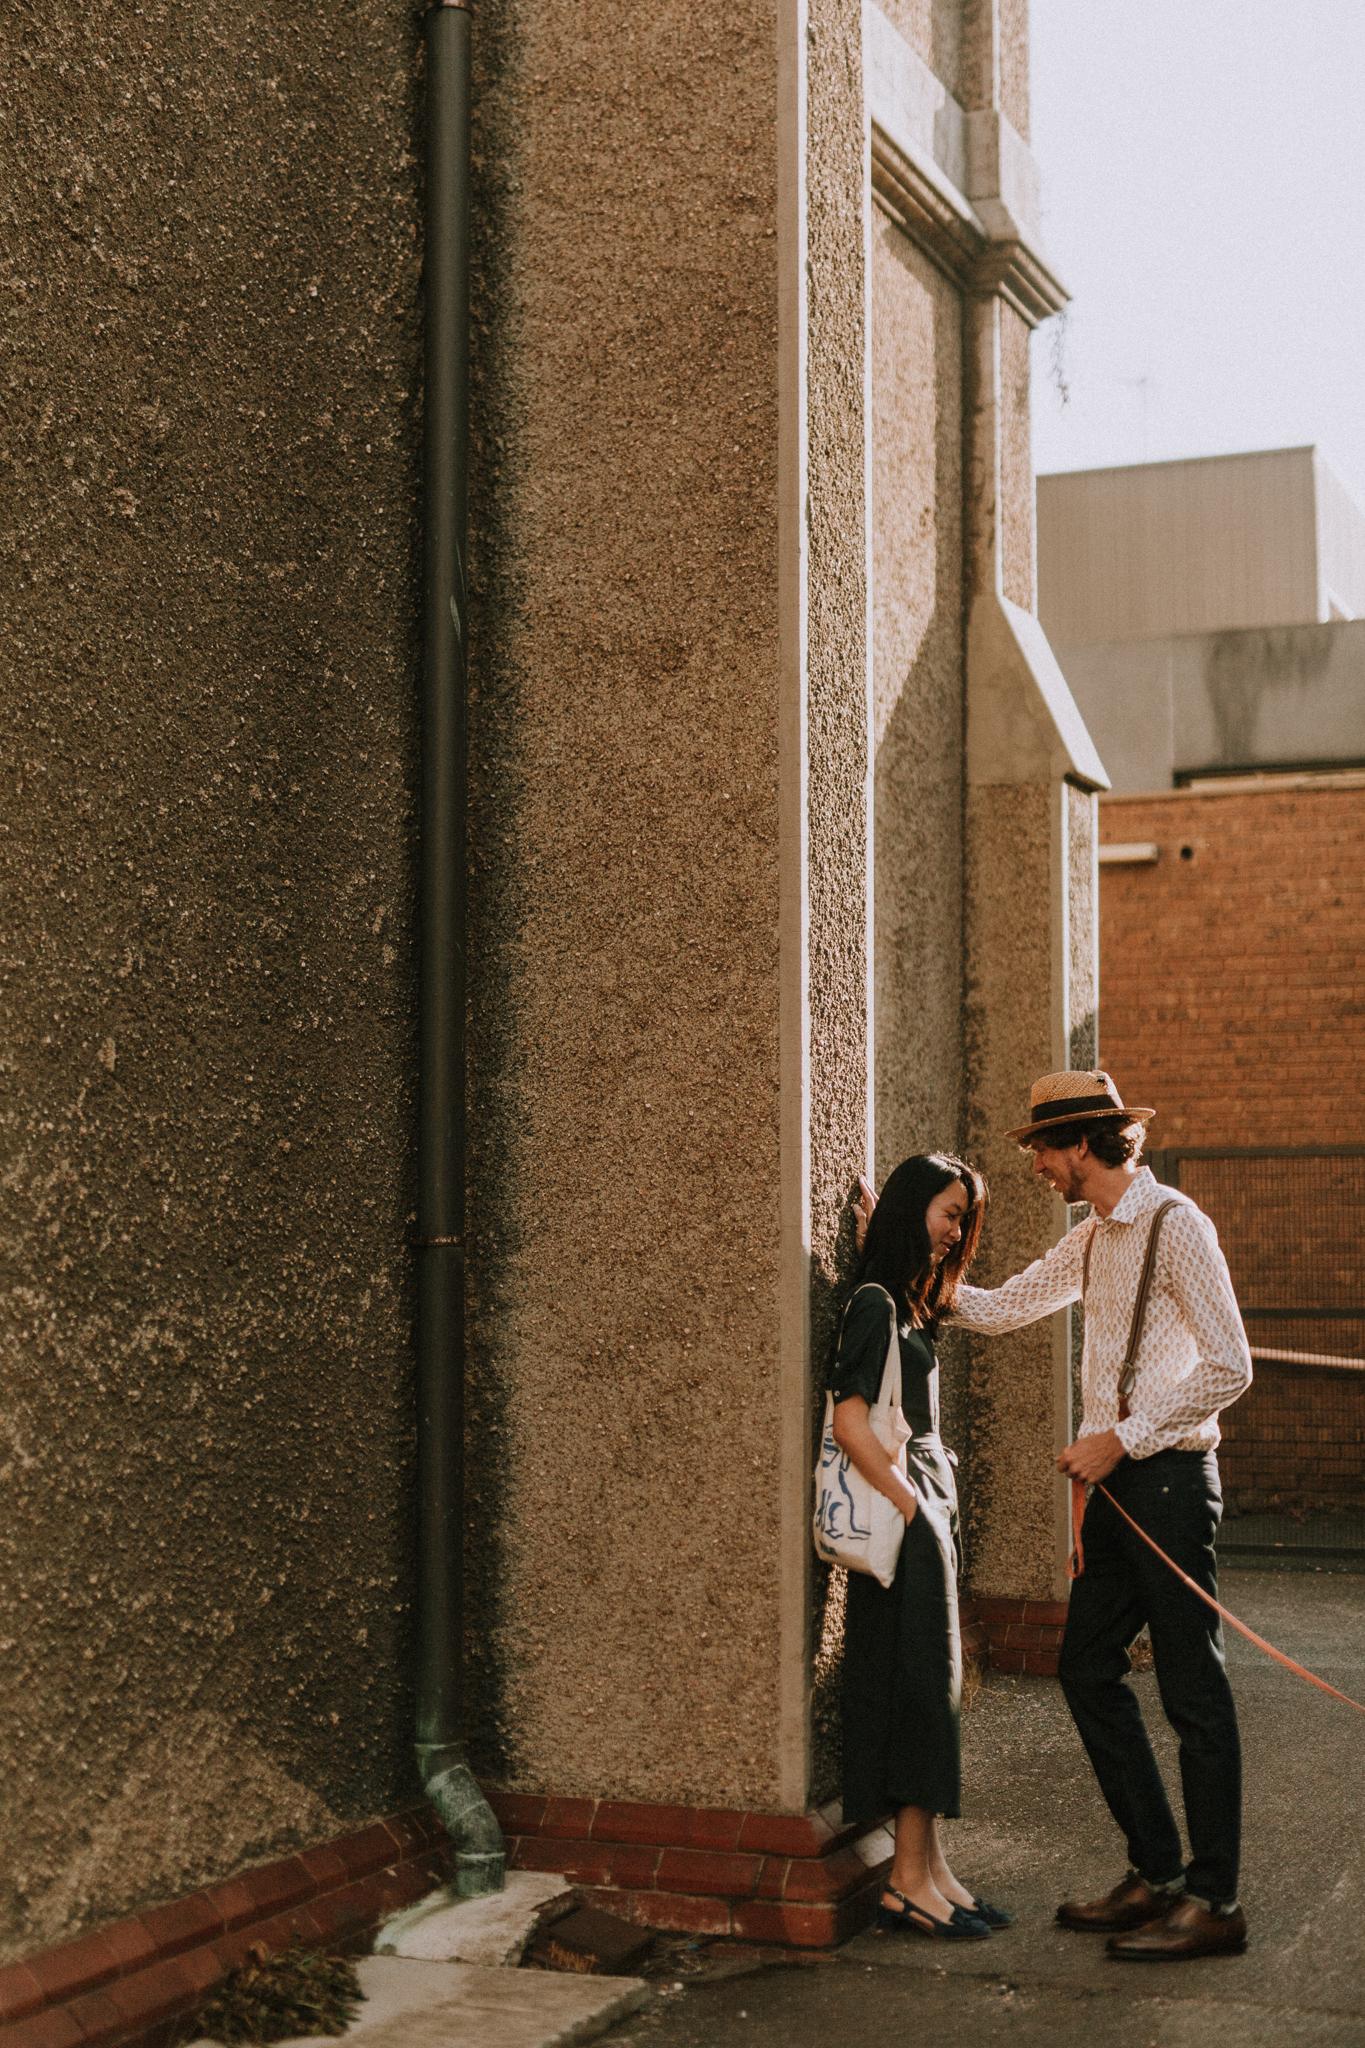 Abbotsford-Convent-couple-session-editorial-EmotionsandMath-008.jpg